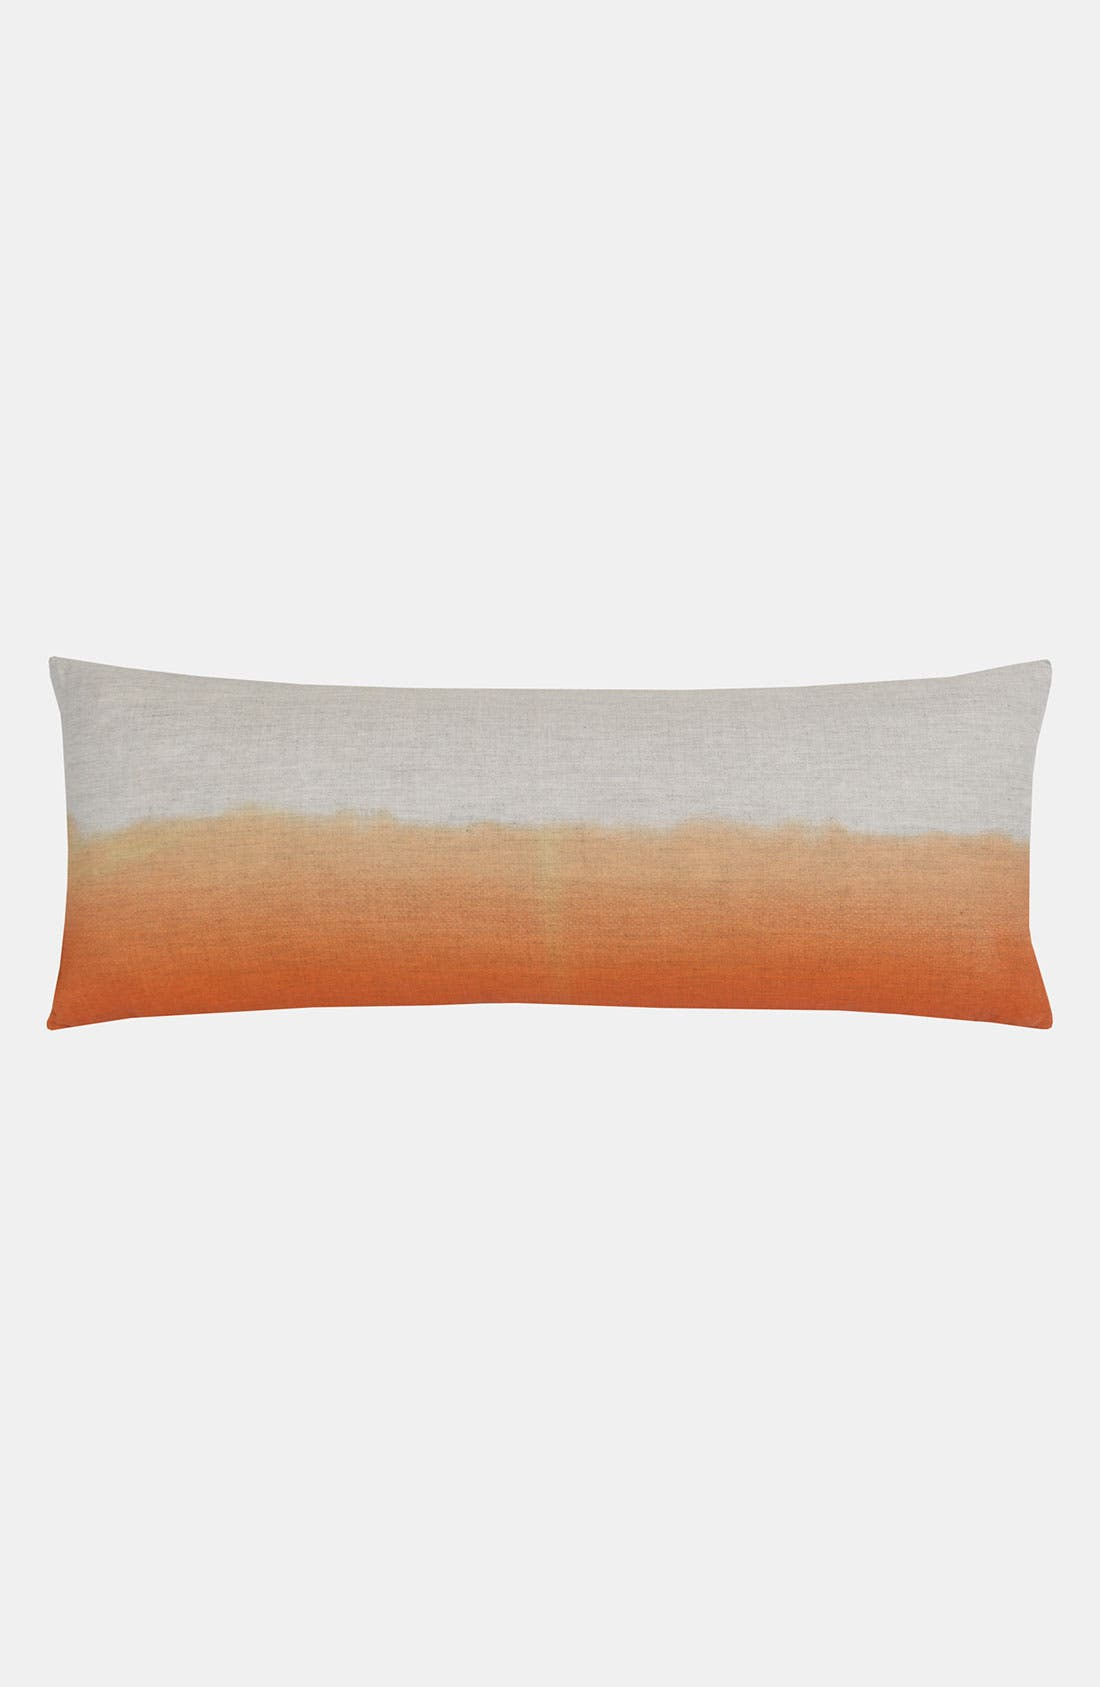 Alternate Image 1 Selected - Blissliving 'Piko' Linen Pillow (Online Only)